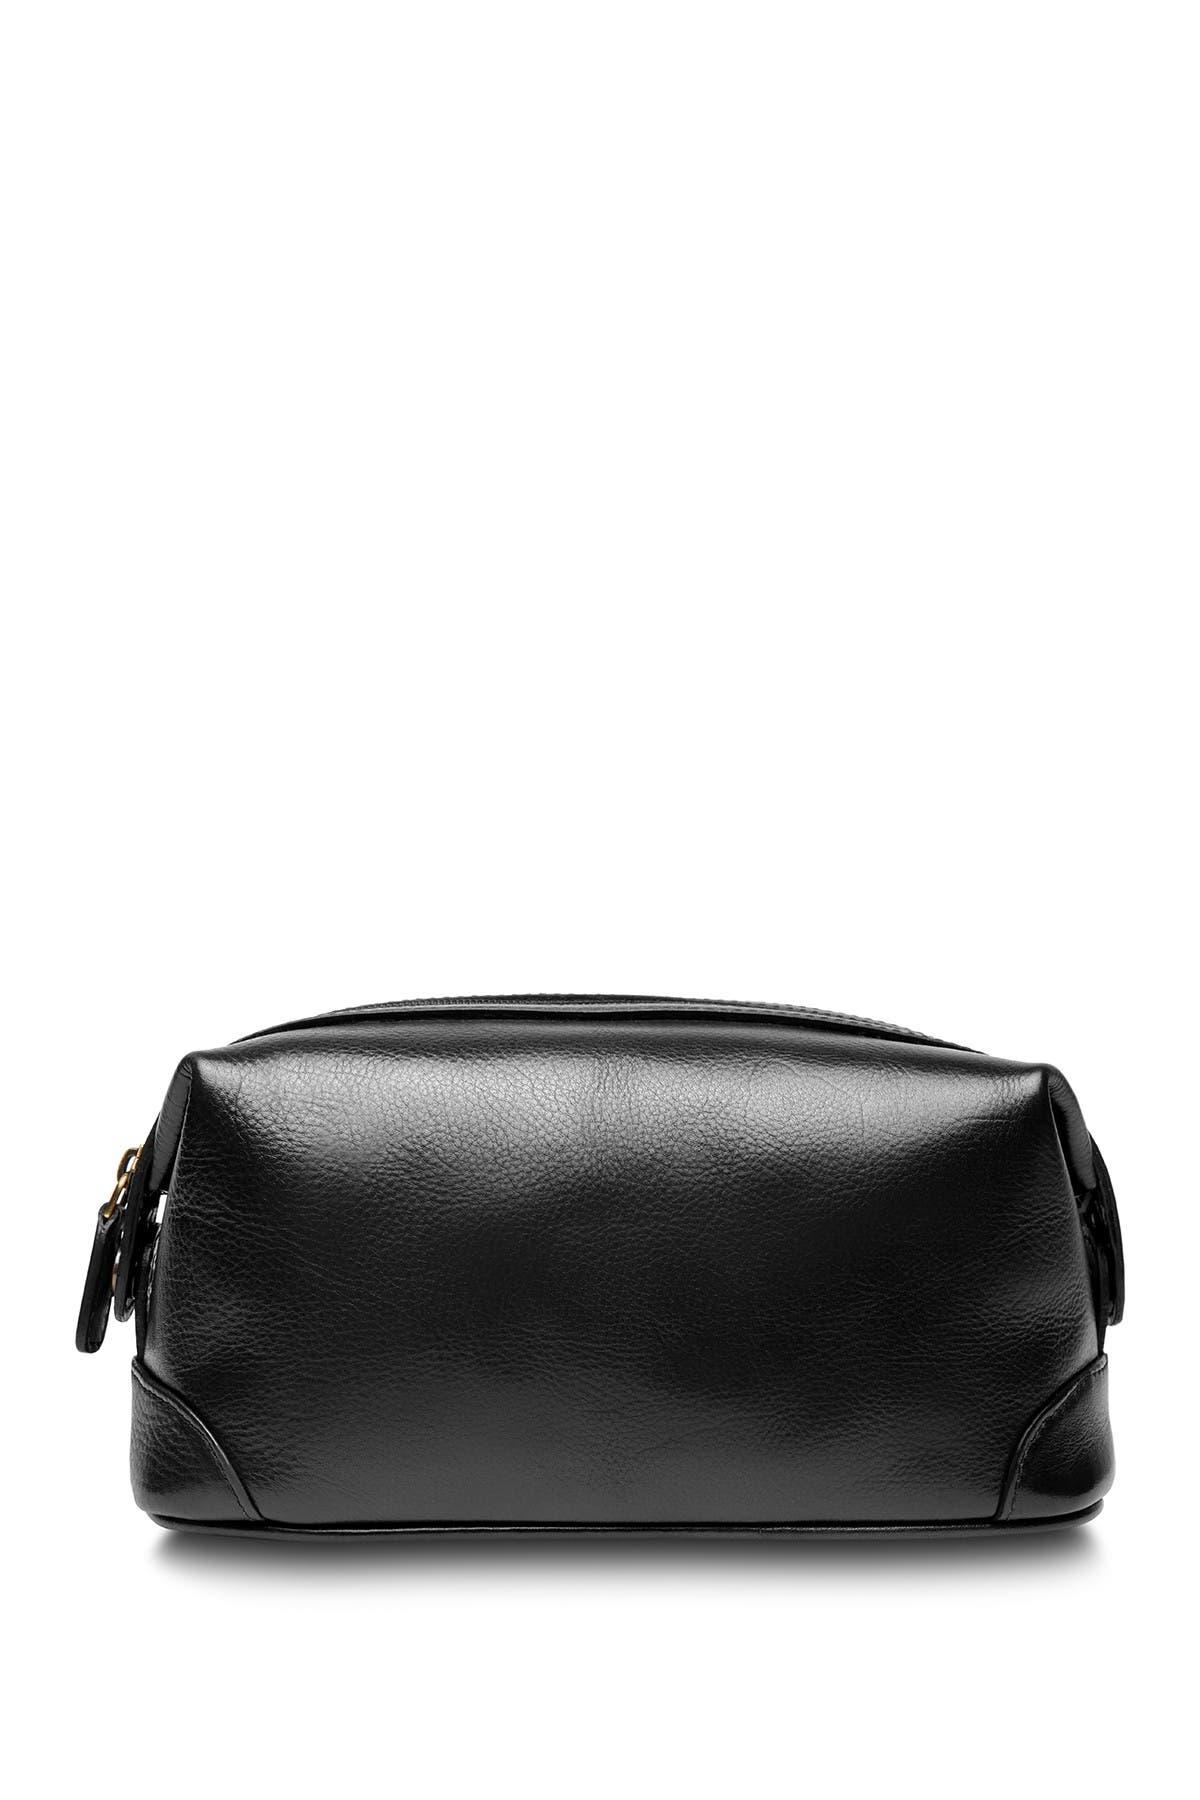 Image of BOSCA Leather Shave Kit